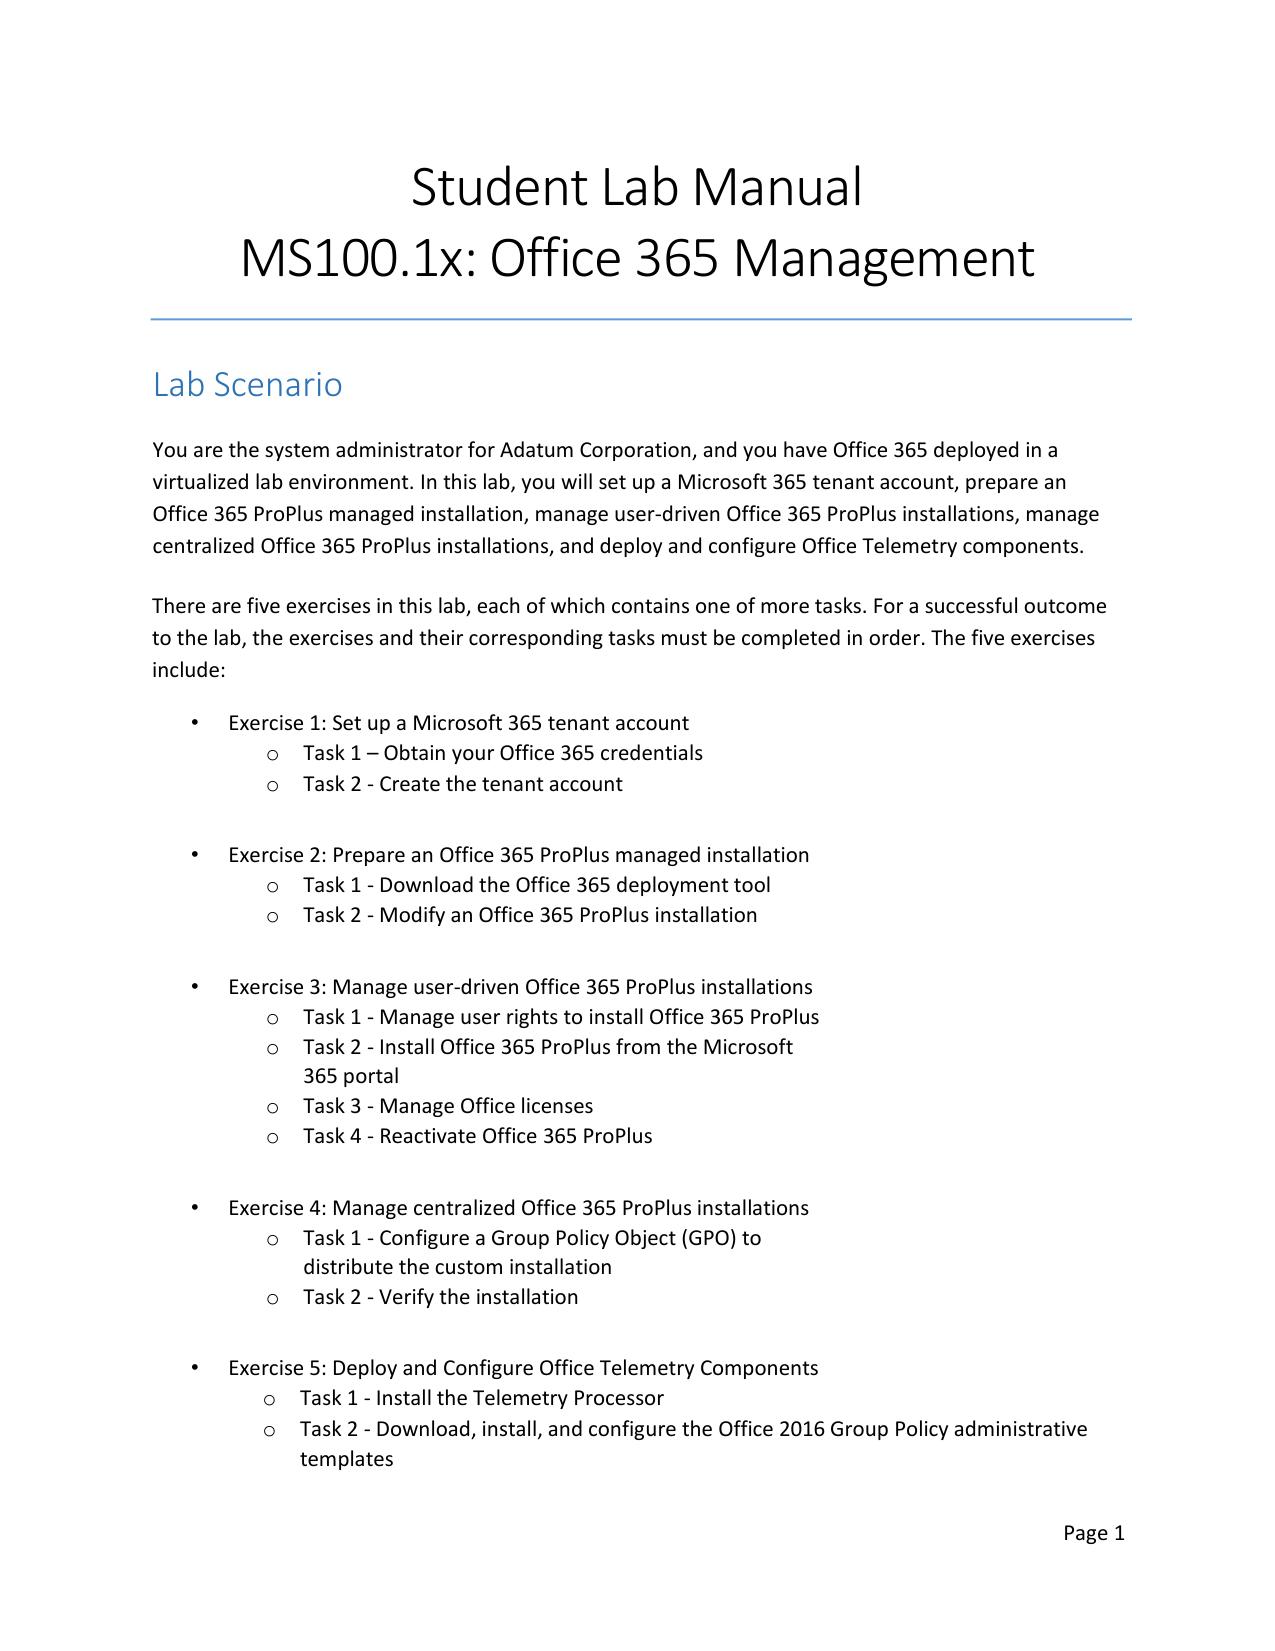 MS-100T01A-ENU-StudentLabManual